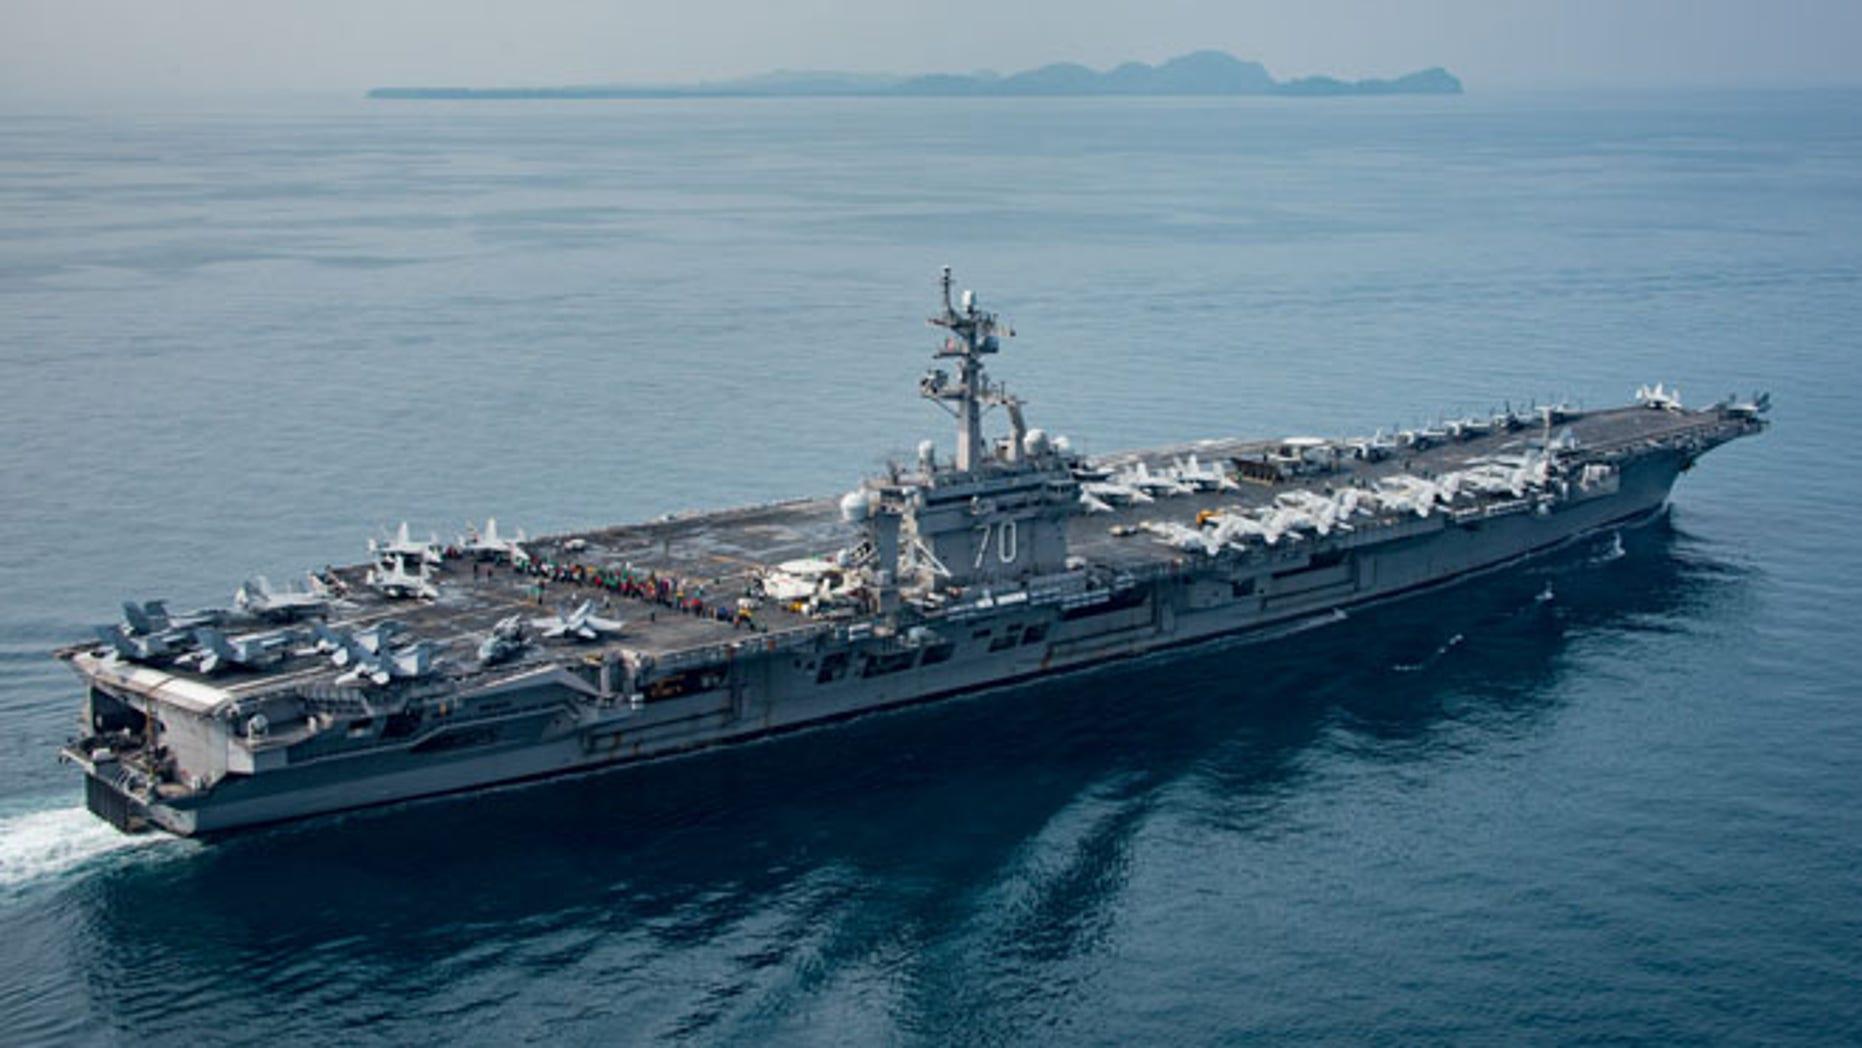 USS Carl Vinson in the Sunda Strait in Indonesia on Friday